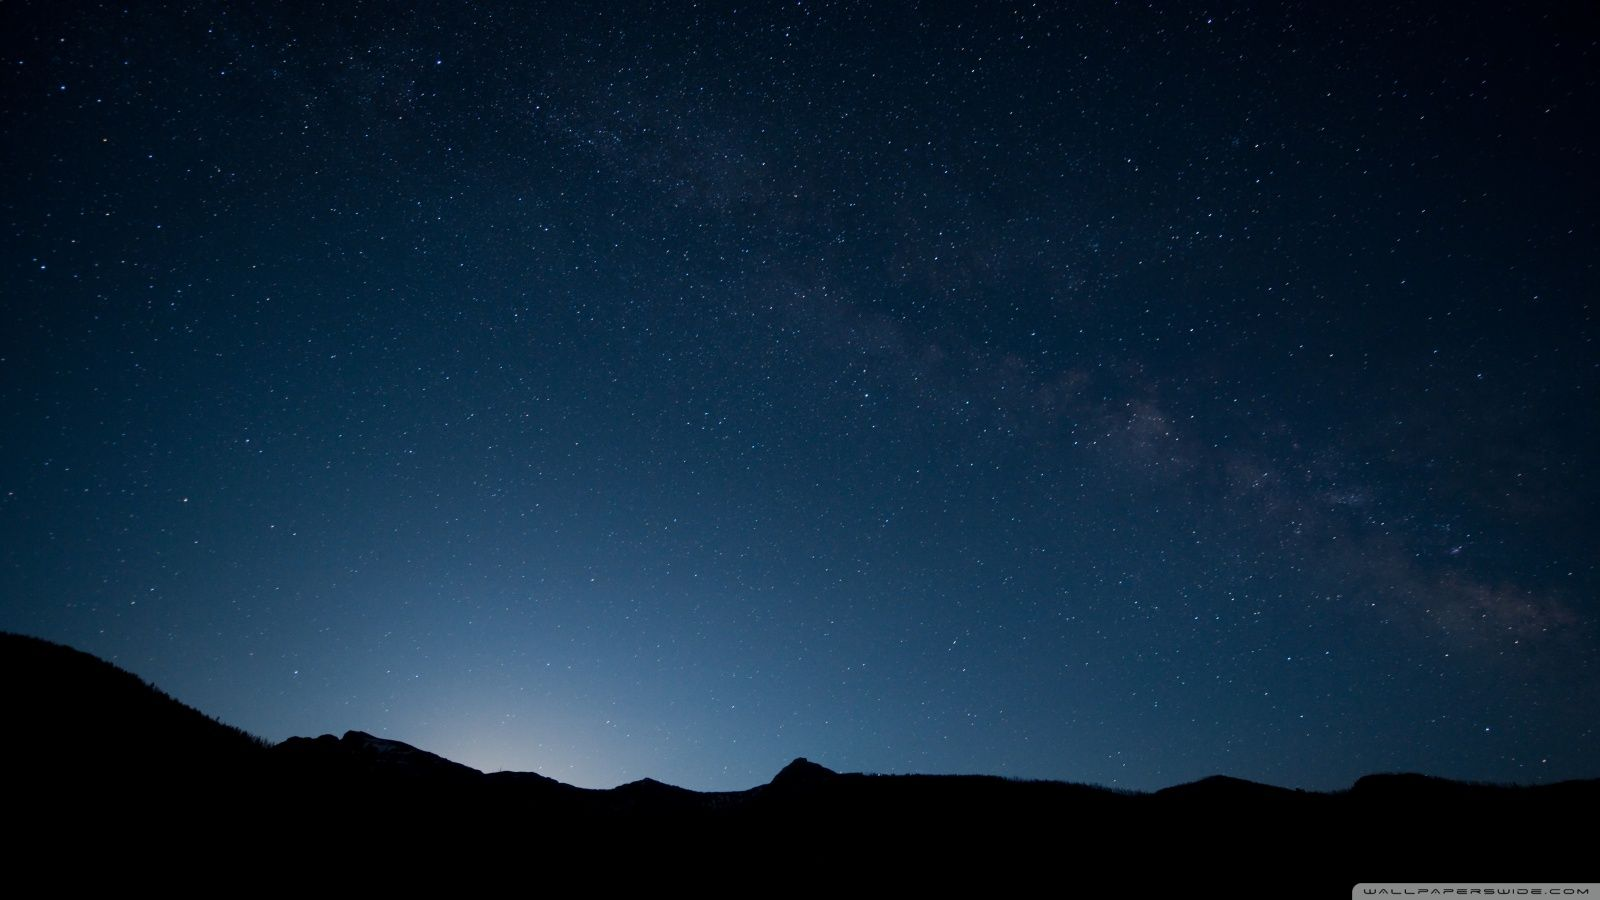 Night Sky Hd Desktop Wallpaper High Definition Fullscreen Night Sky Wallpaper Night Sky Hd Night Skies